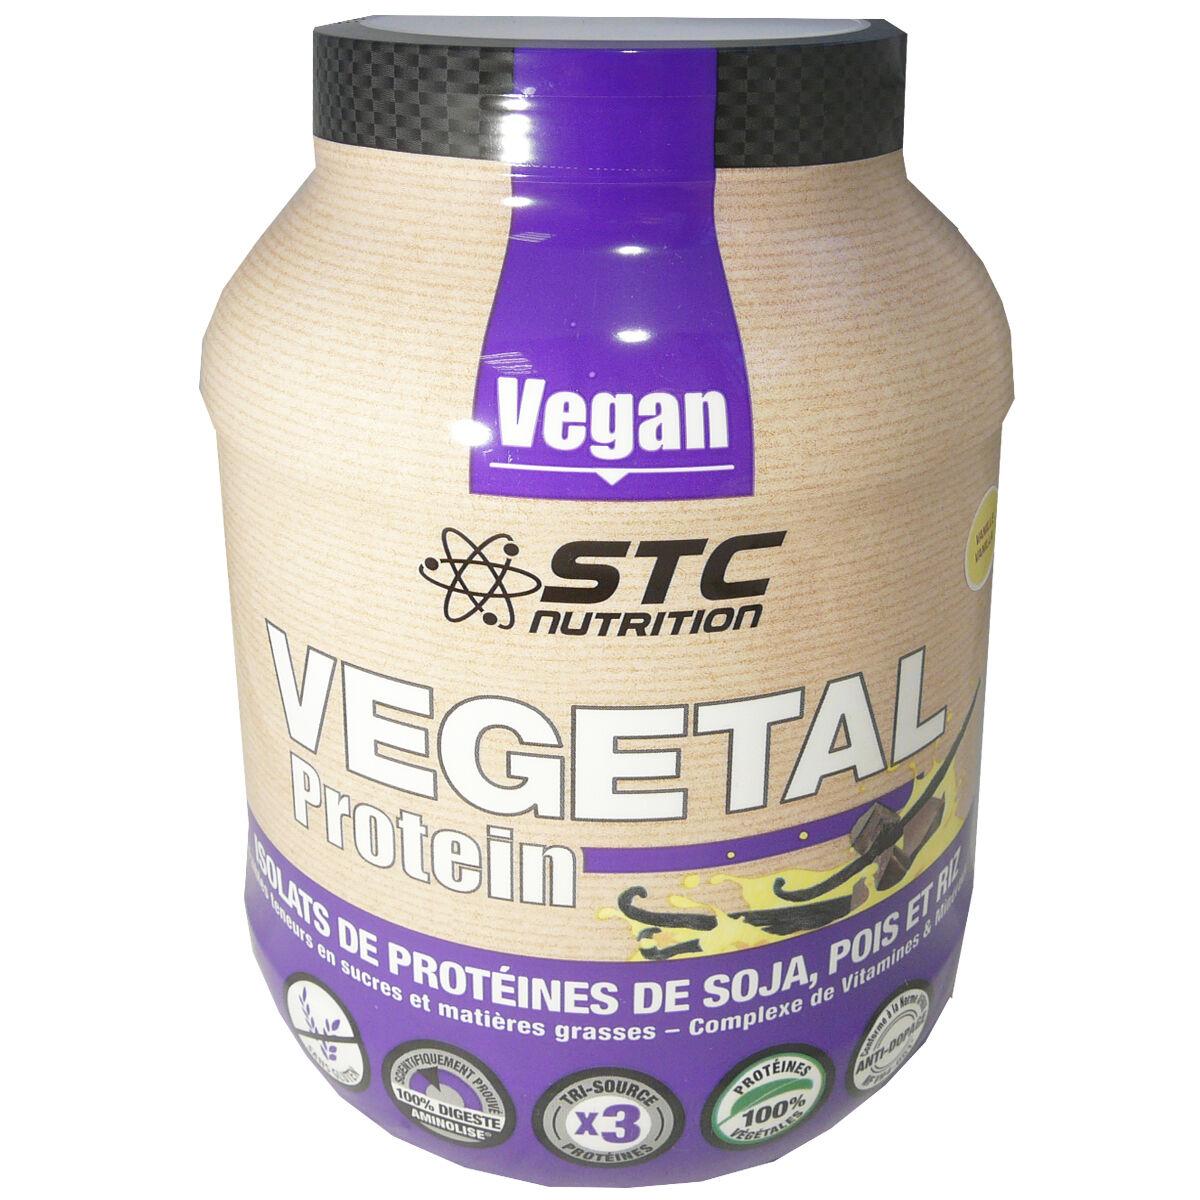 STC NUTRITION Vegetal protein saveur vanille isolats de proteines de soja, pois, riz 750 g